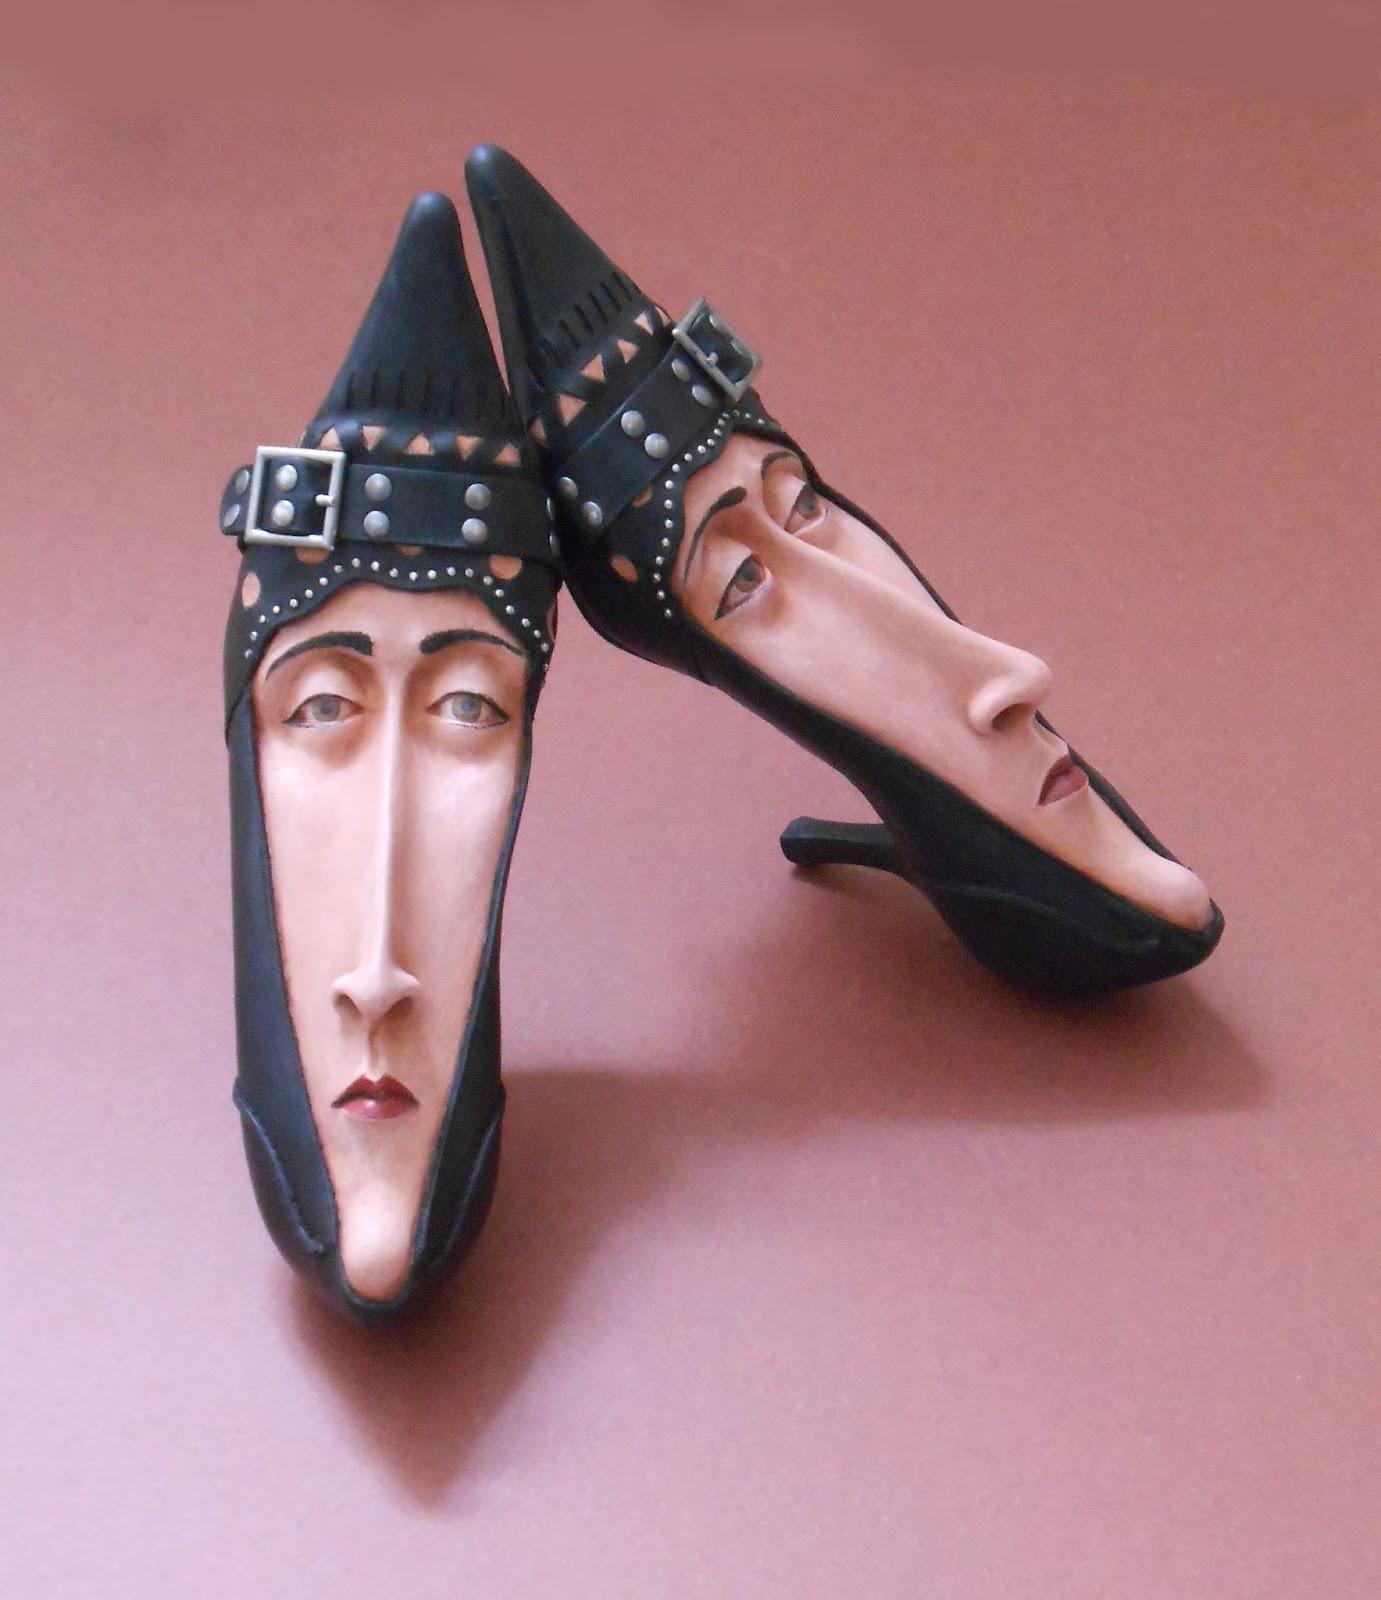 Русский feet фетиш 19 фотография